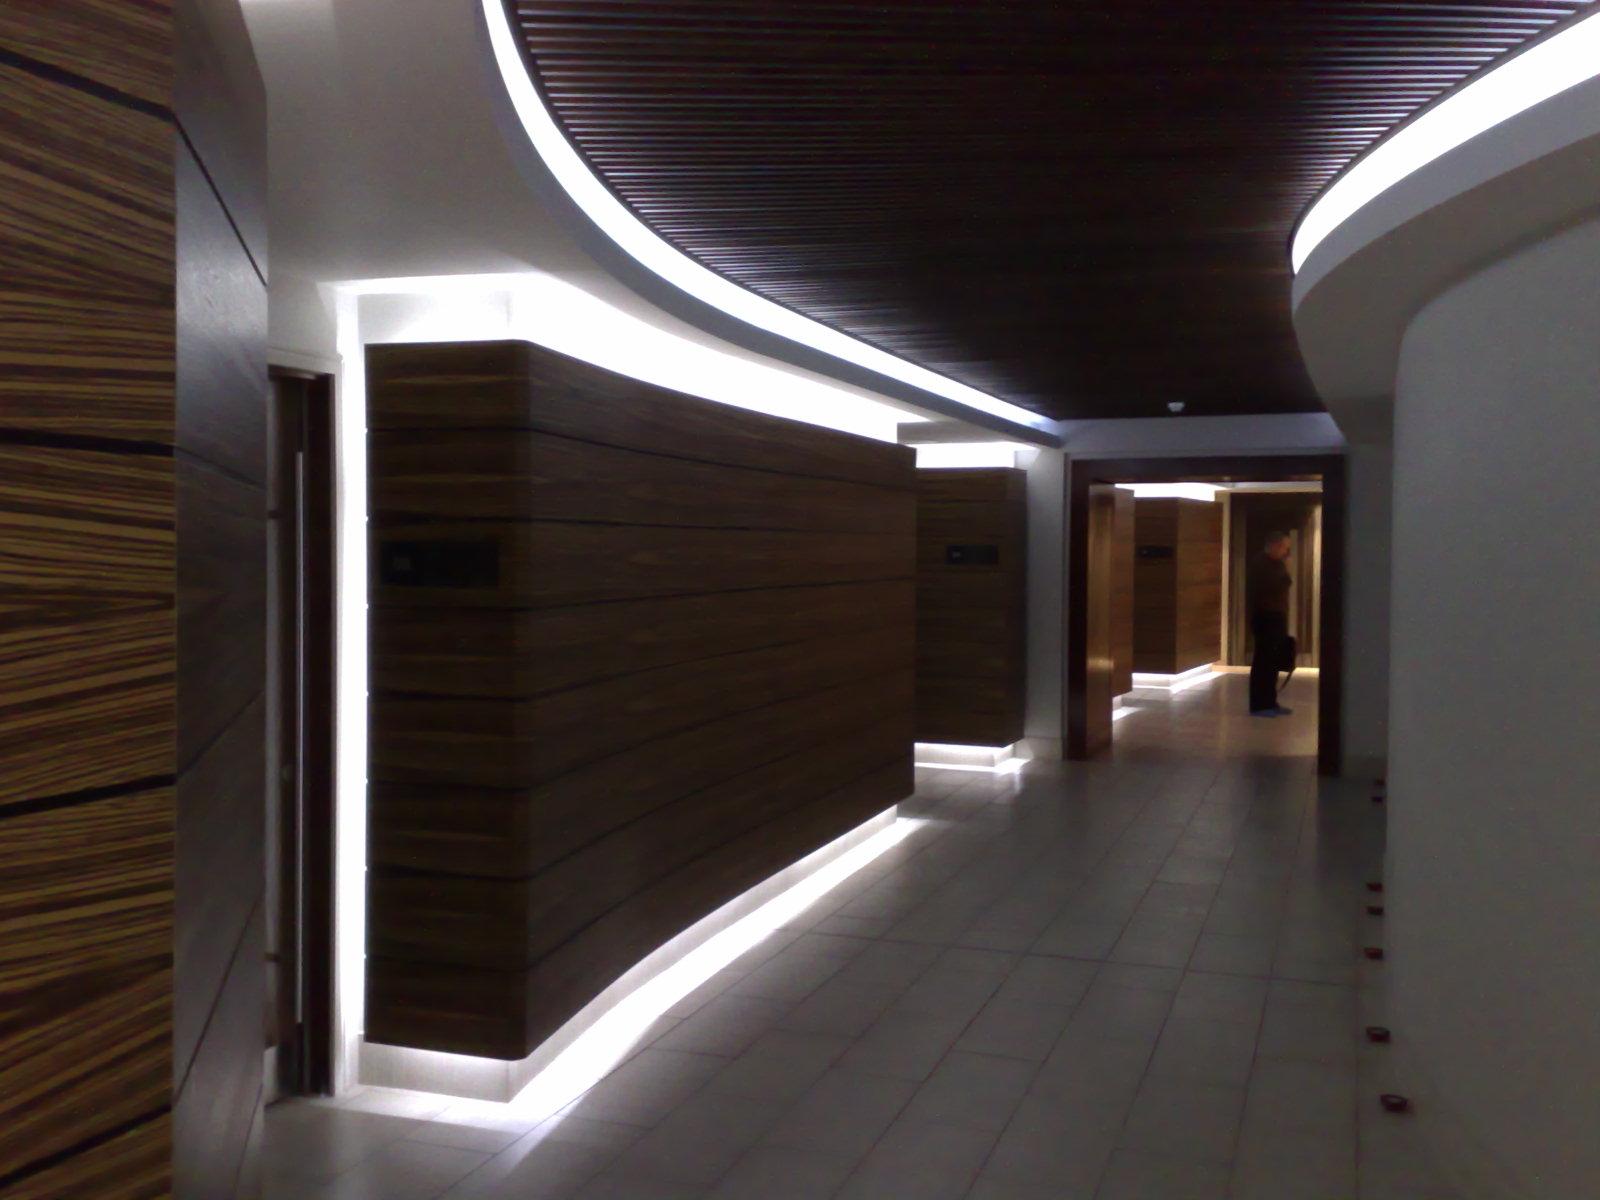 led lights from fofx hotel style. Black Bedroom Furniture Sets. Home Design Ideas